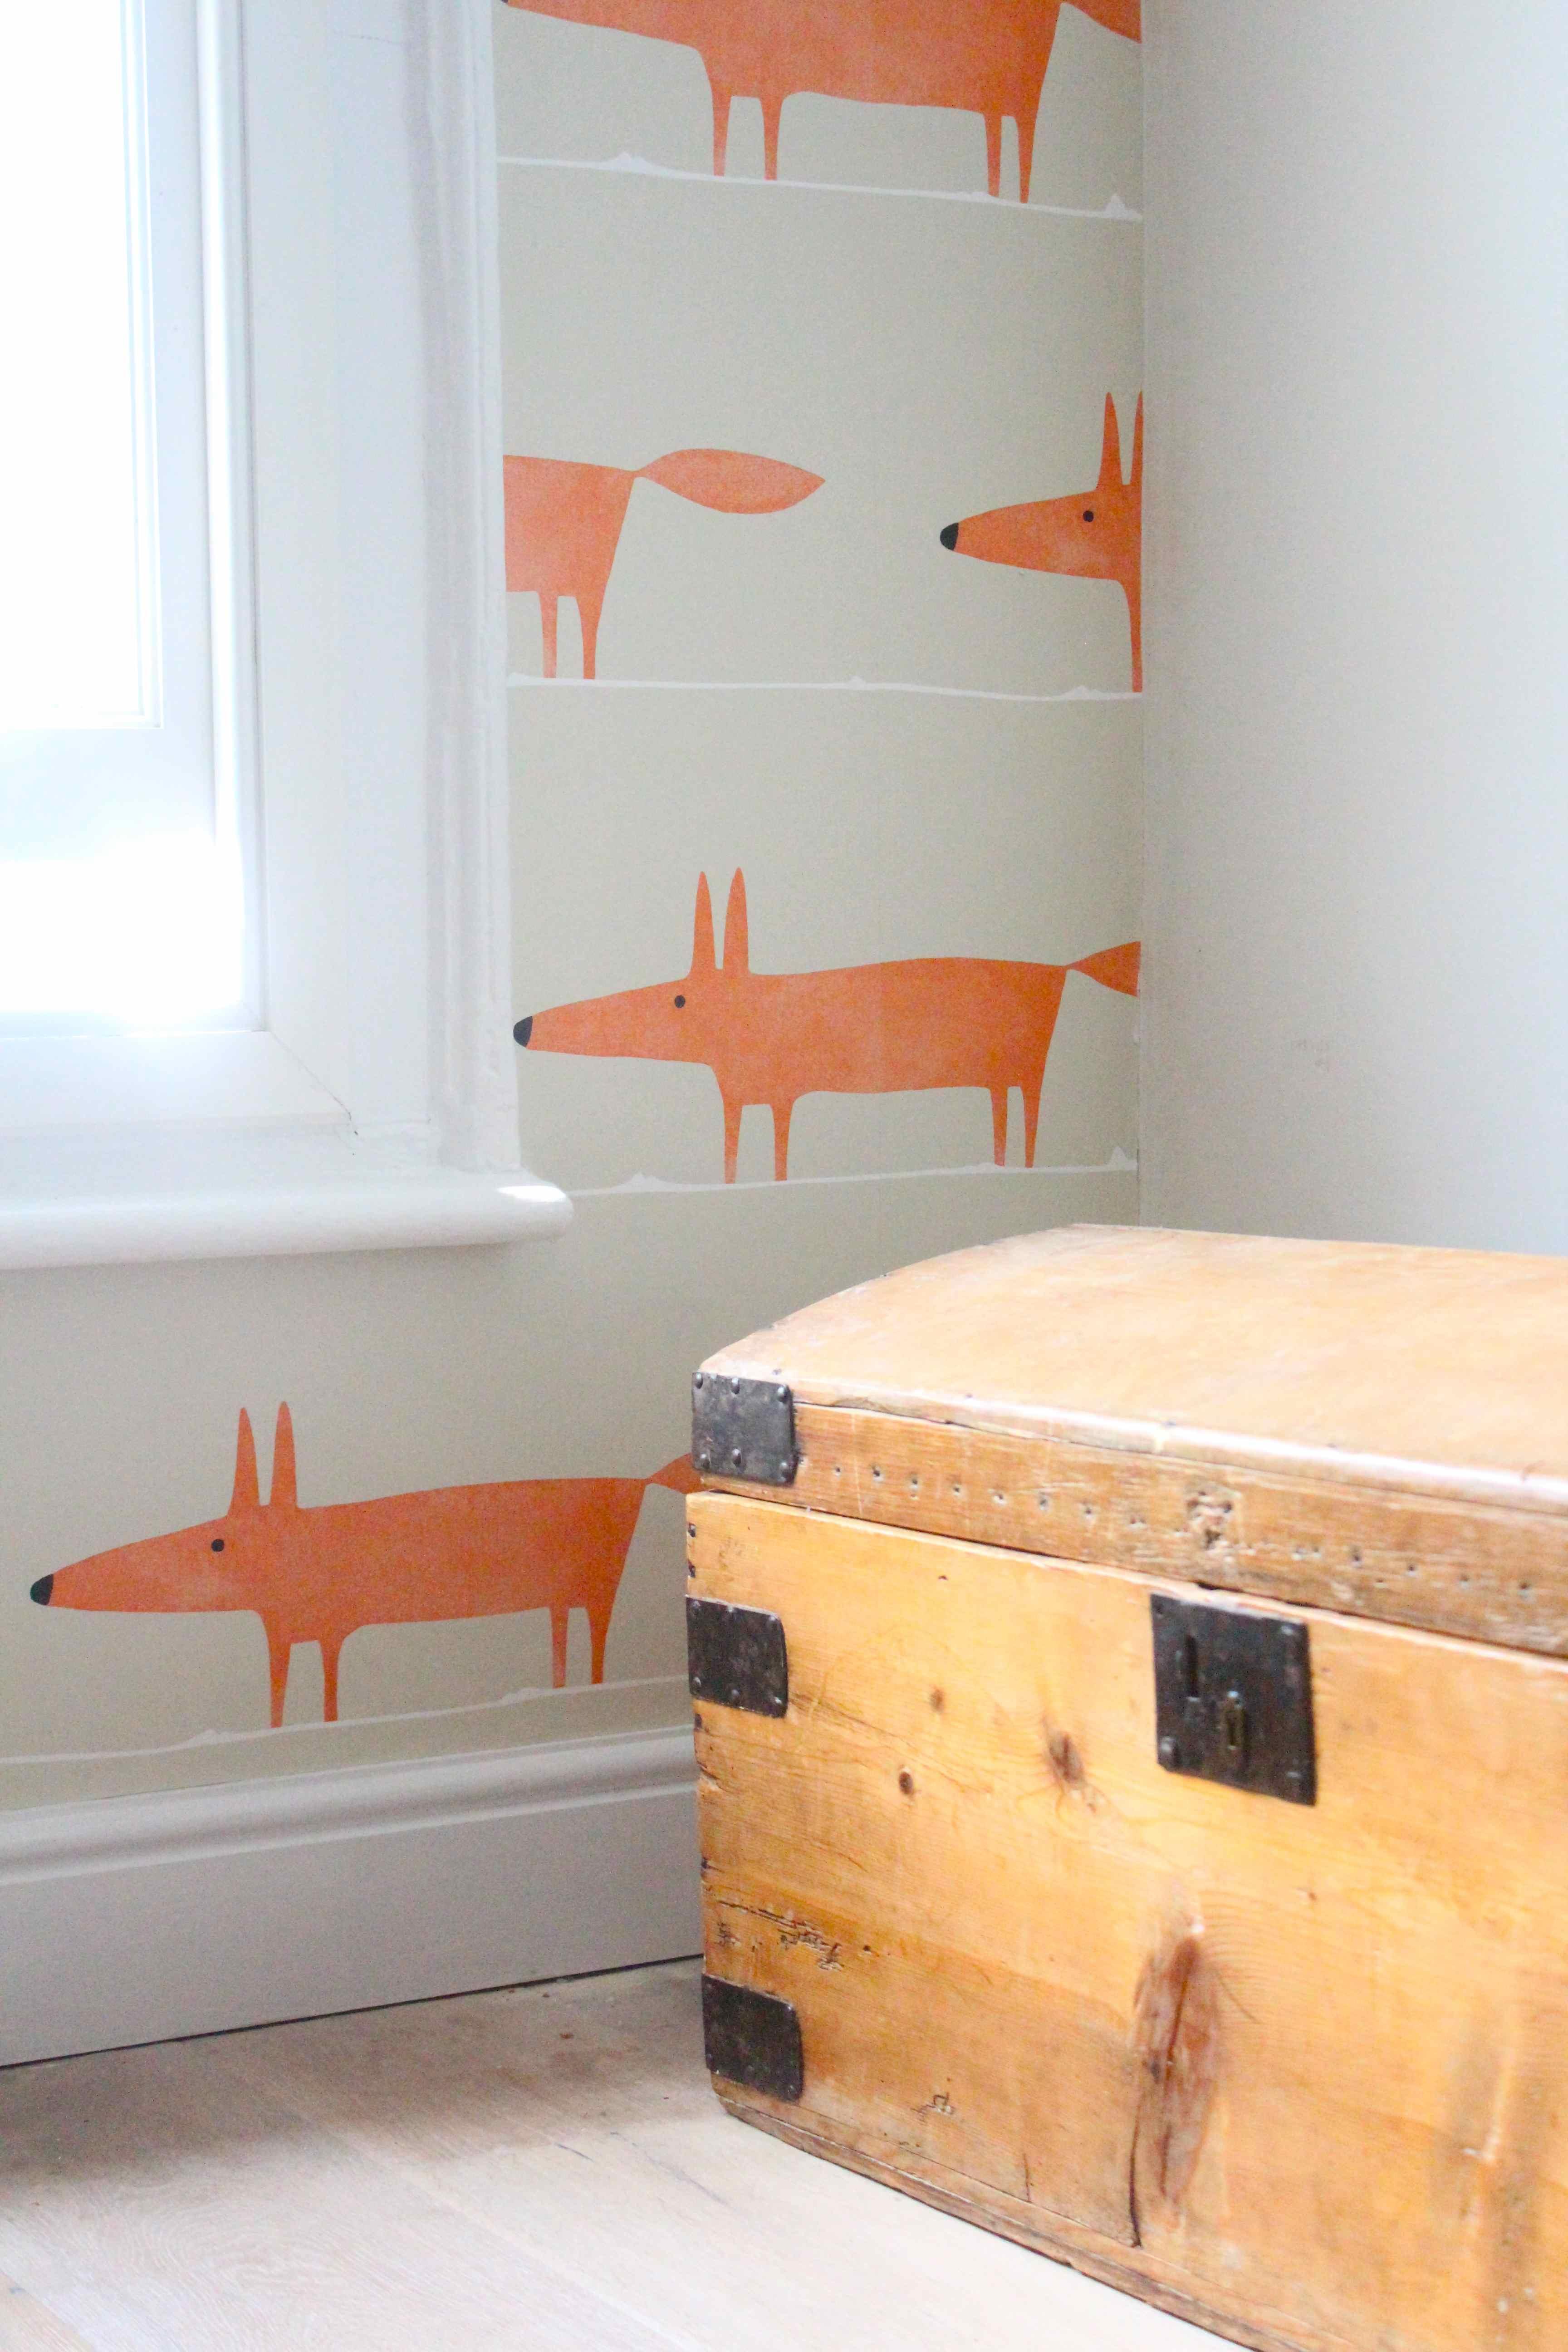 Mr Fox Ginger Wallpaper Scion Mr Fox Nursery 1111403 Hd Wallpaper Backgrounds Download